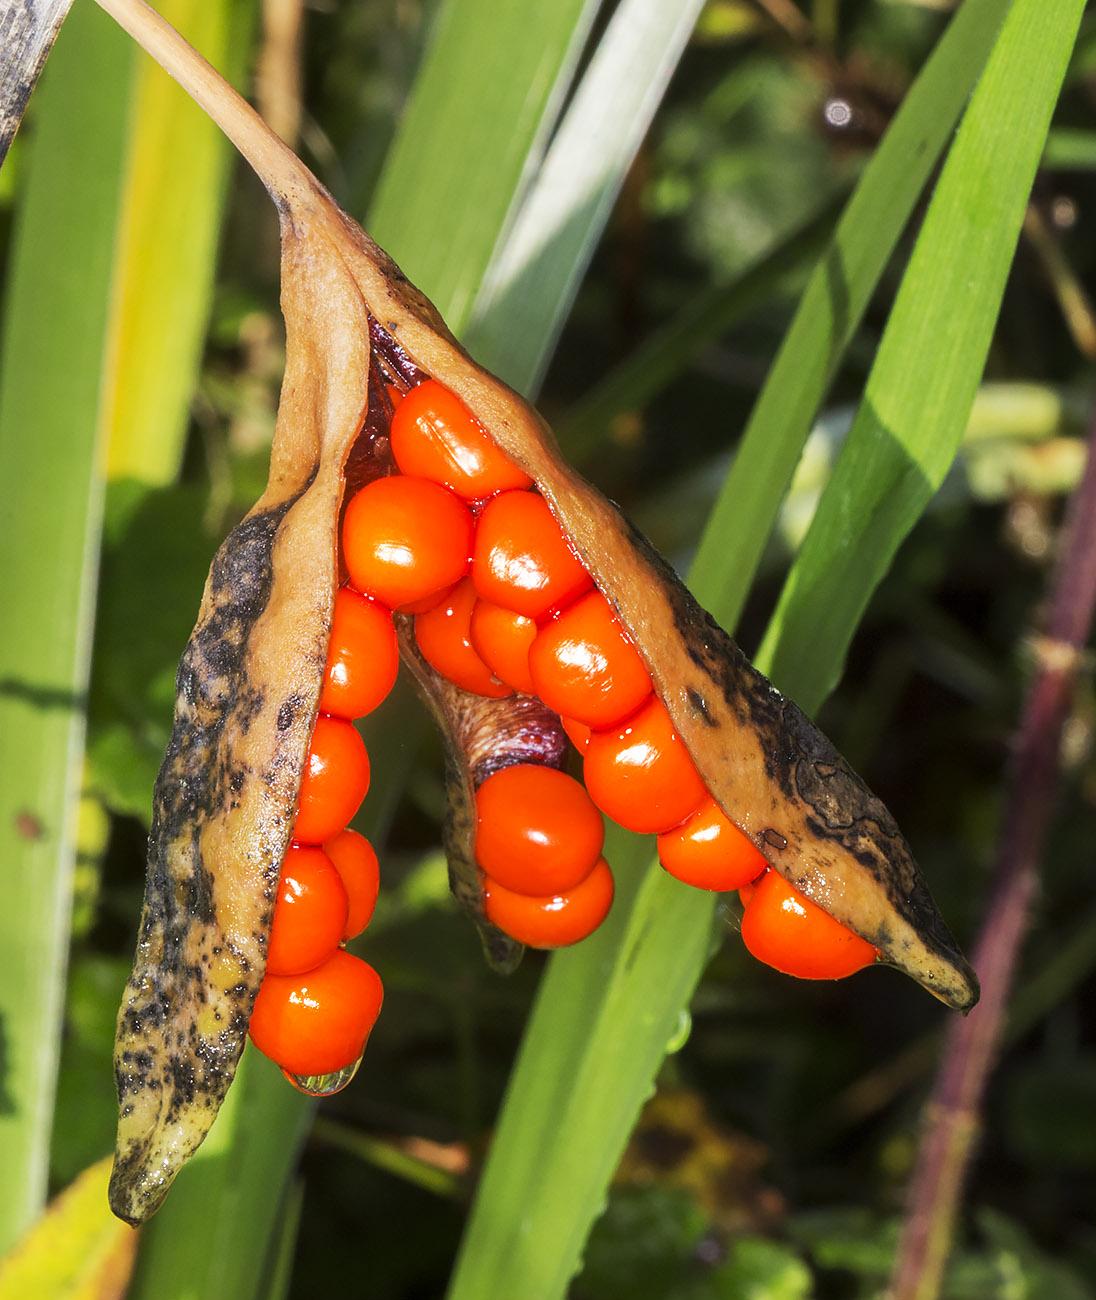 Seed pod of Stinking Iris, Iris foetidissima.  Sevenoaks Wildlife Reserve, 4 November 2014.